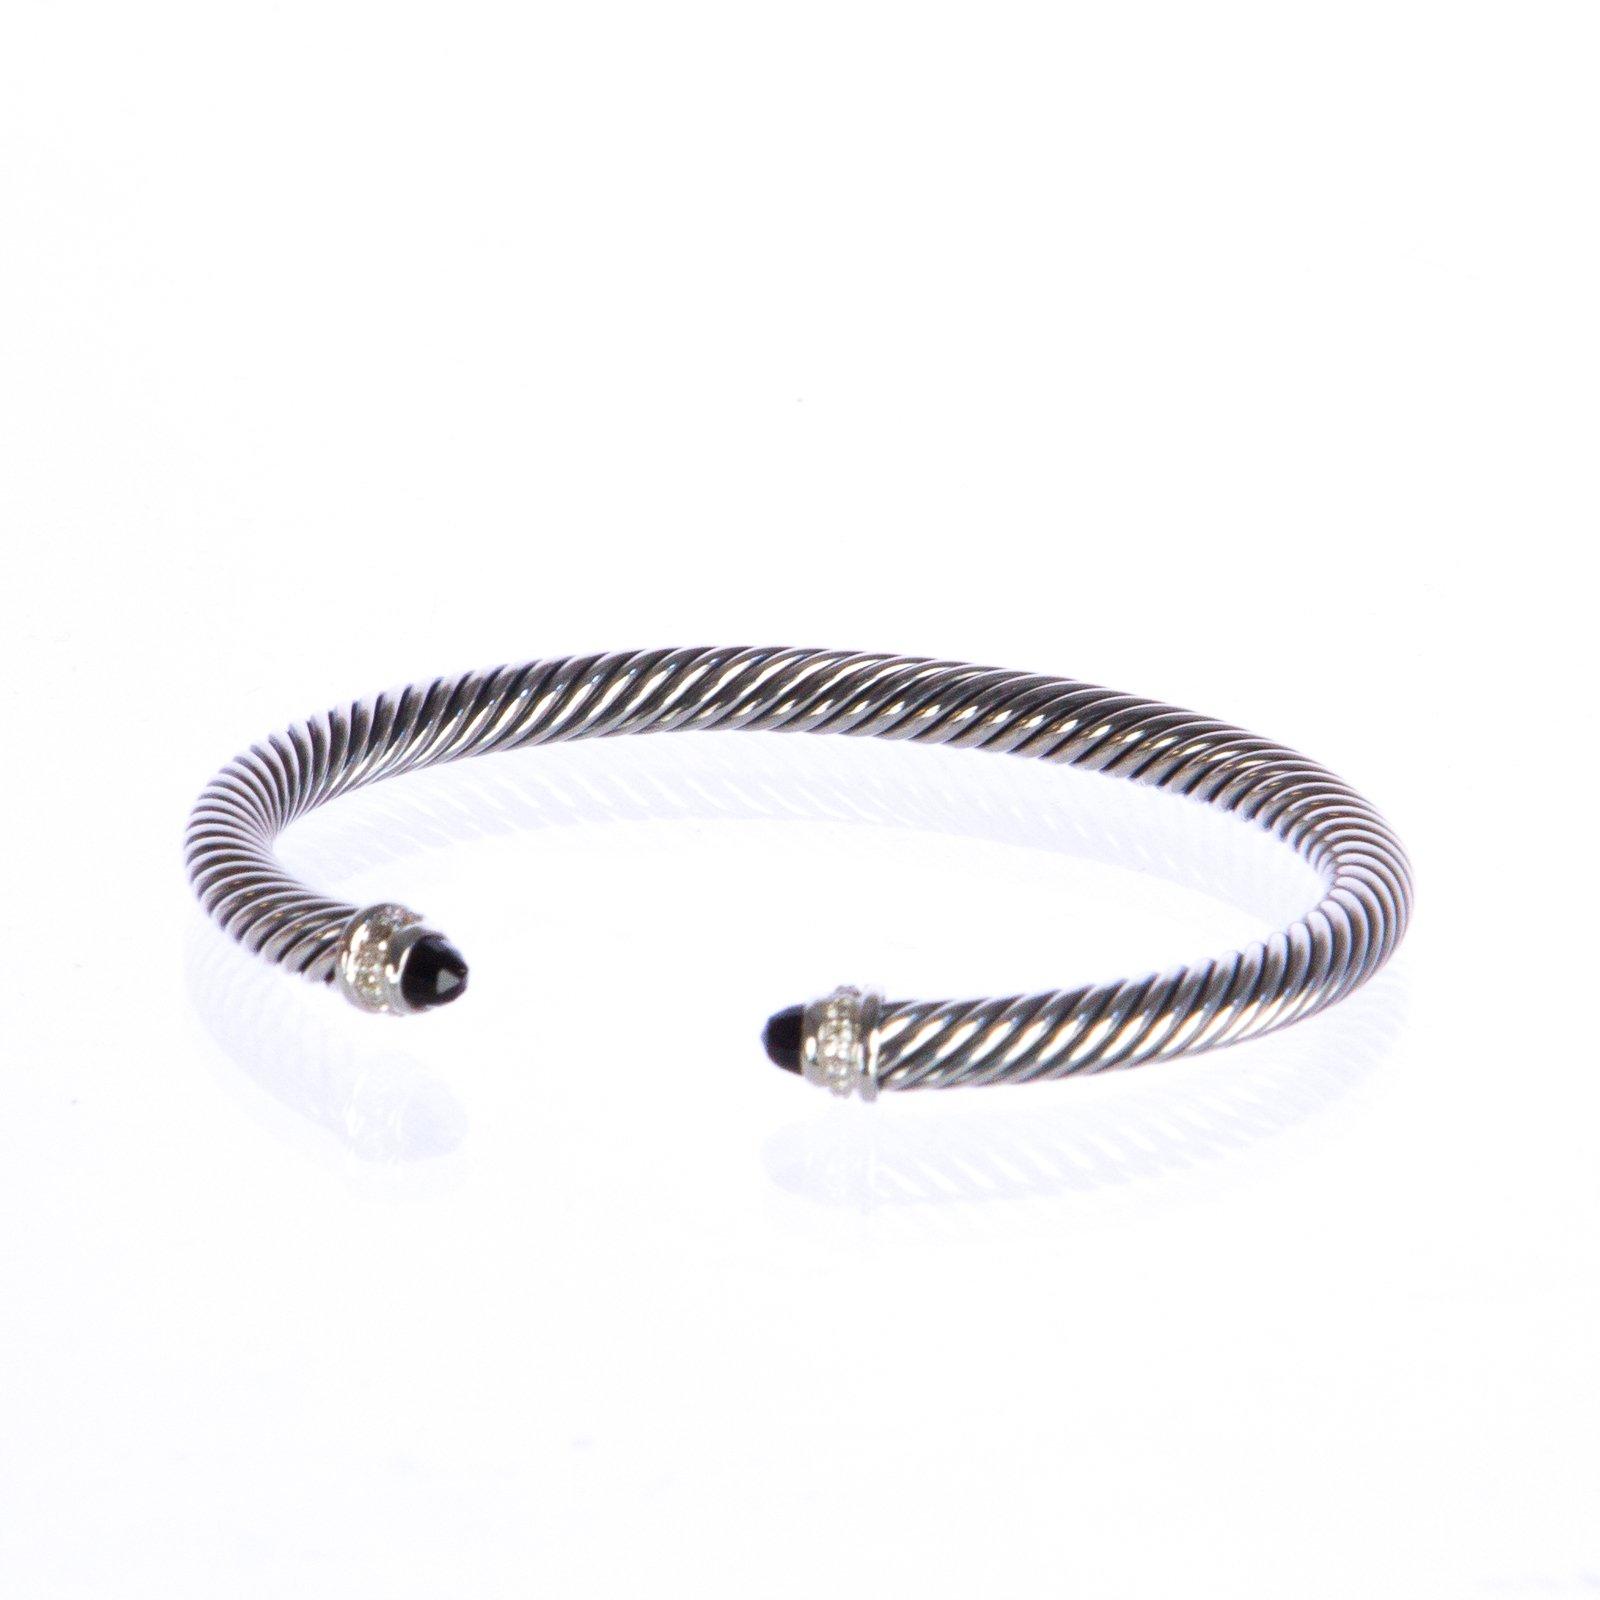 DAVID YURMAN Sterling Silver Cable Classics Bracelet 5mm (Black Onyx)